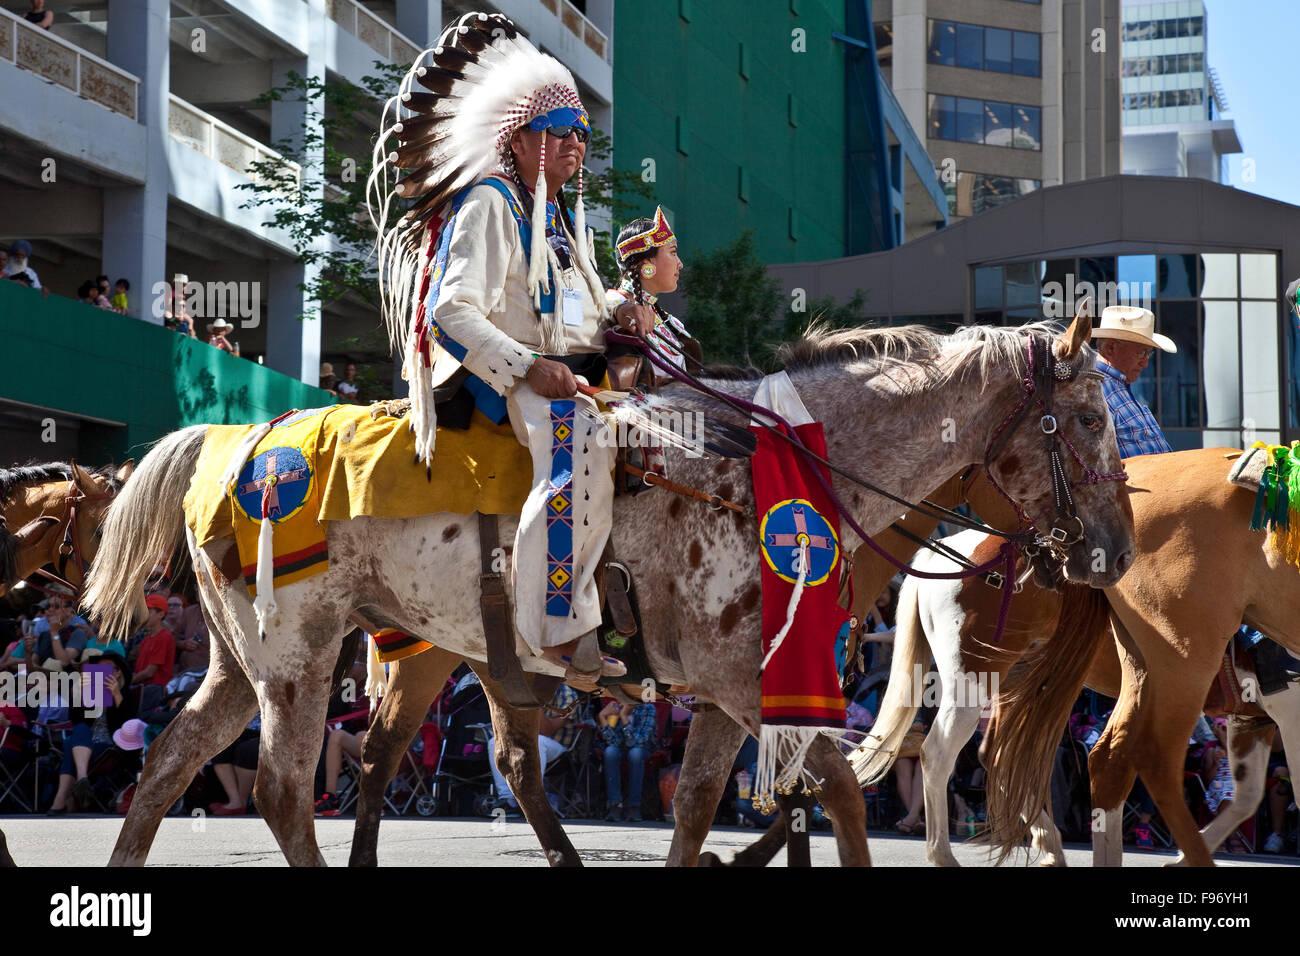 2015 Calgary Stampede Parade, Calgary, Alberta, Canada. - Stock Image